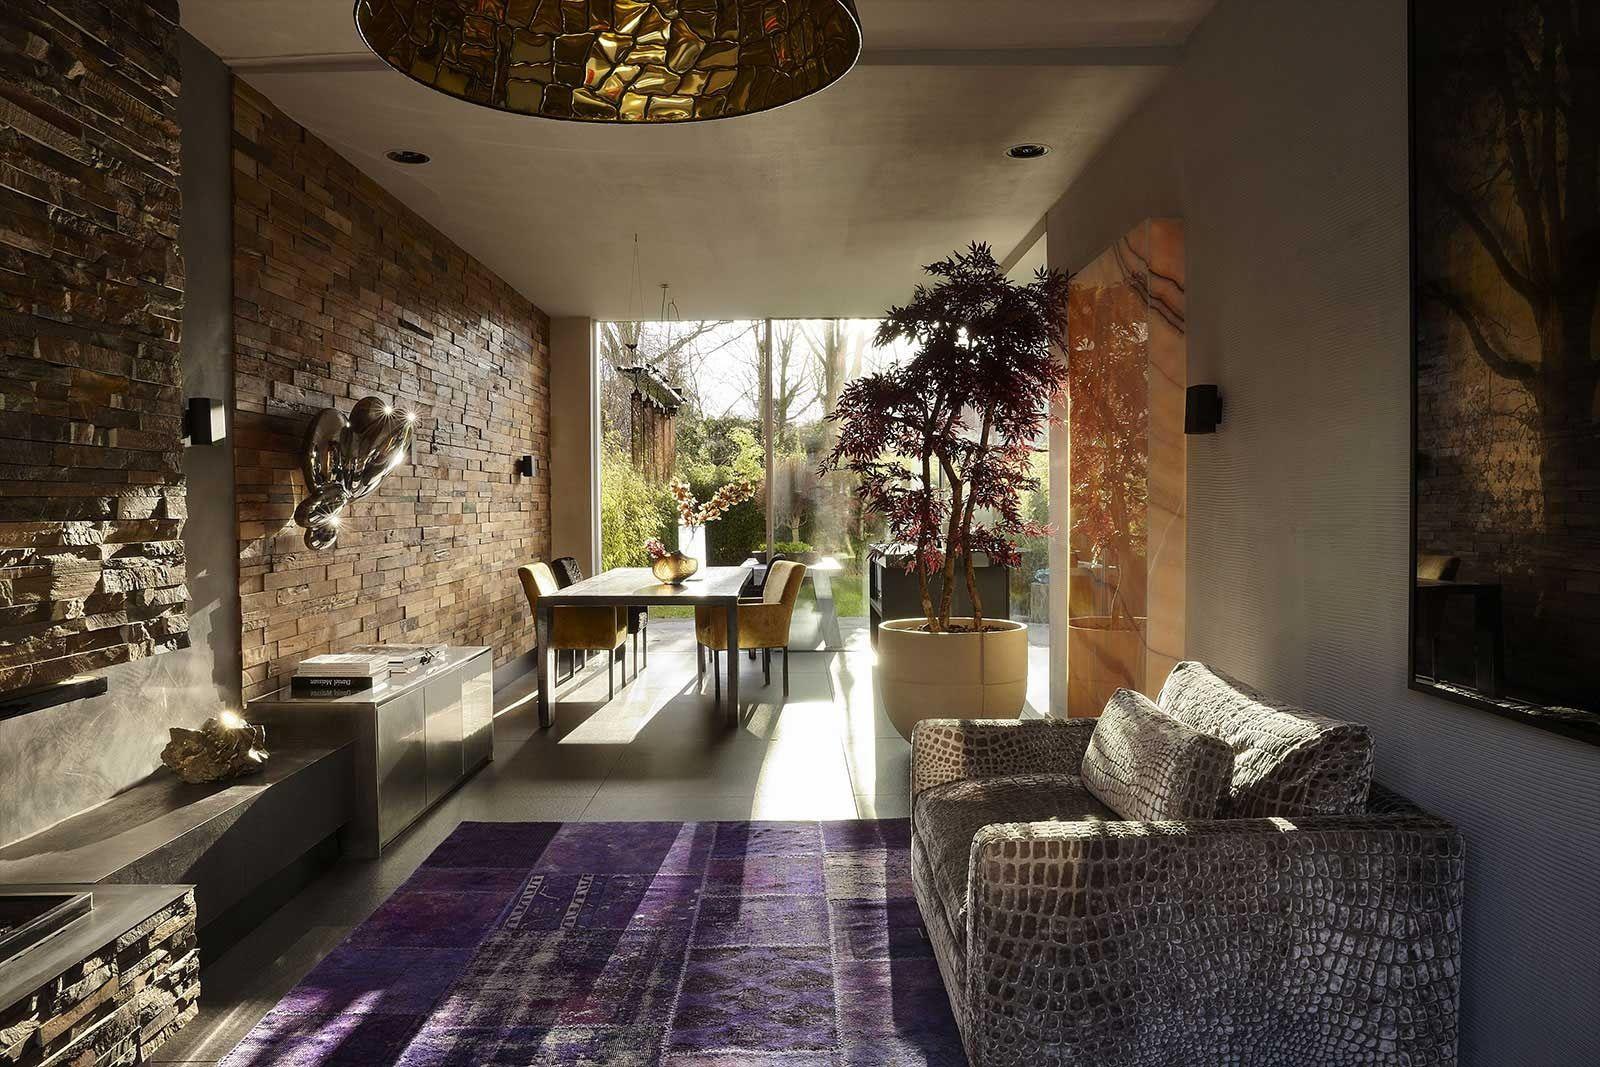 Interior design by Osiris Hertman Studio